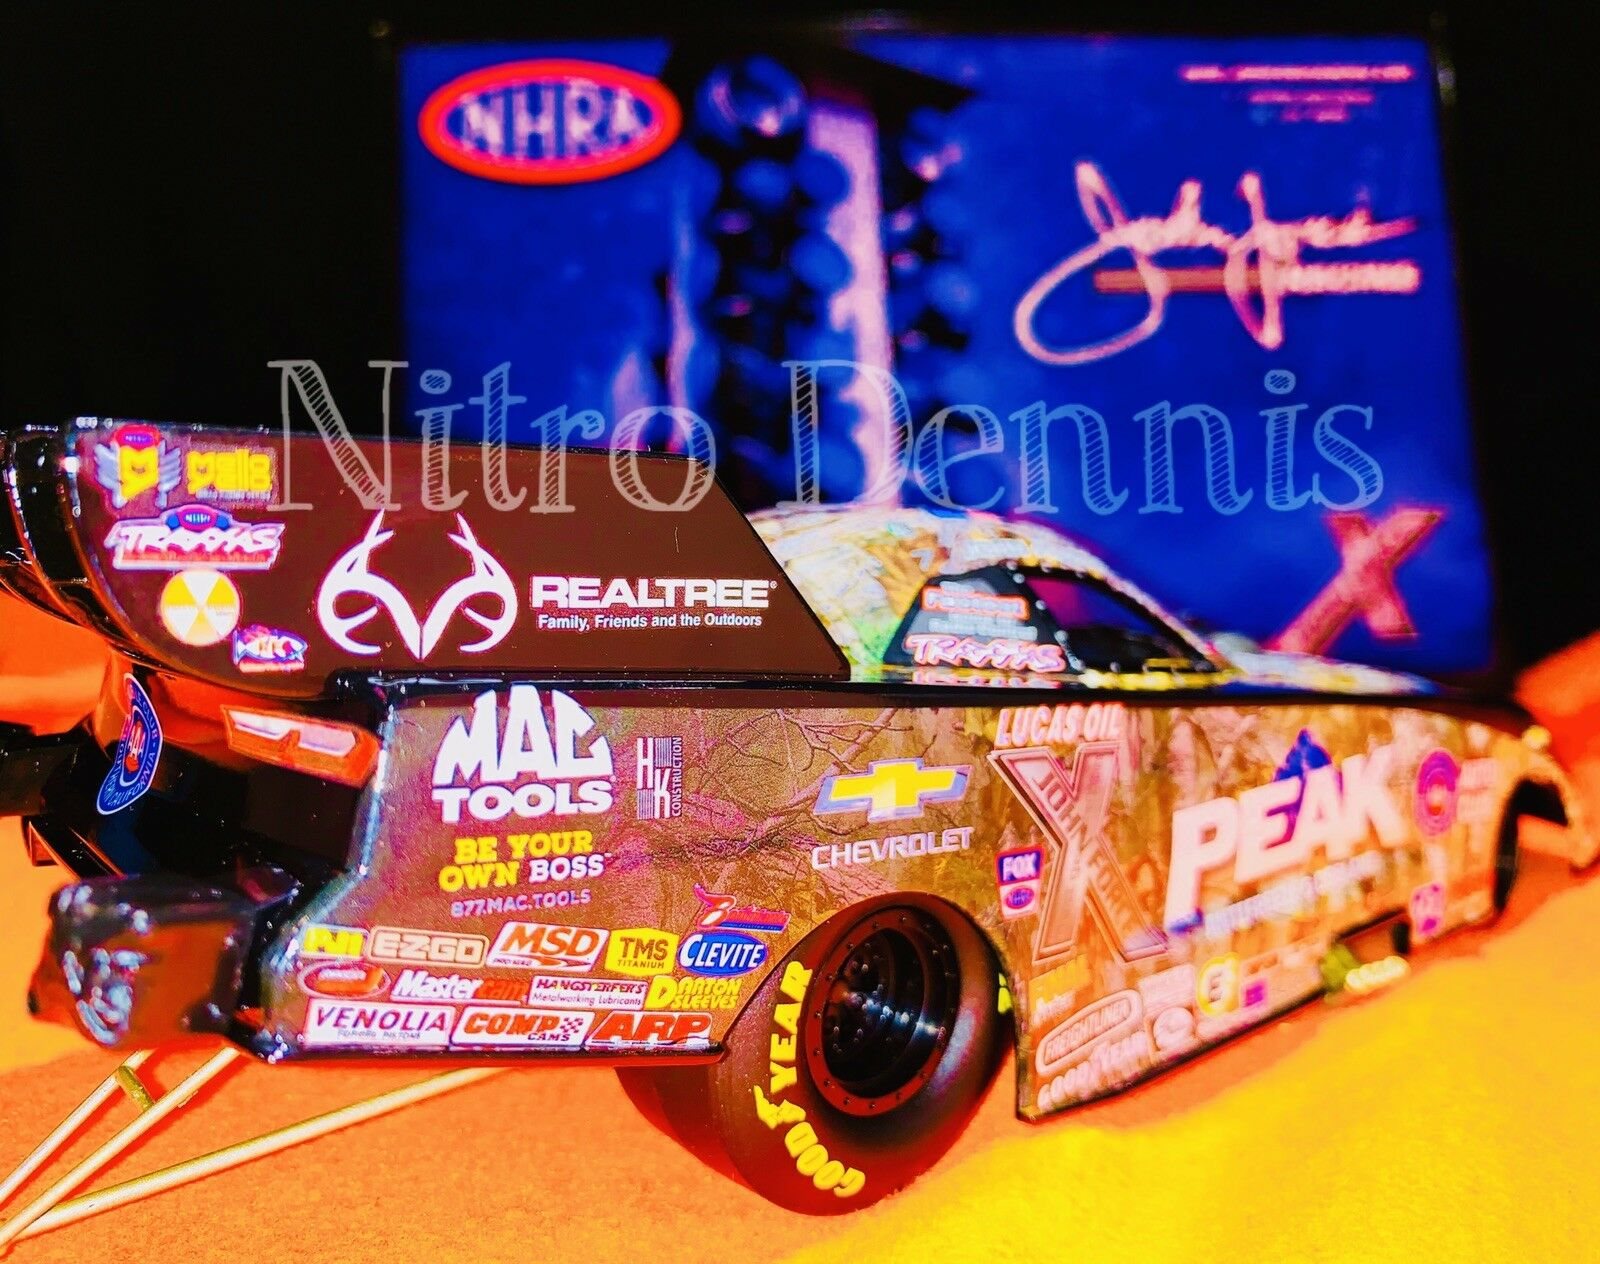 NHRA JOHN FORCE 1 24 Diecast PEAK Funny Car NITRO 16 ACTION Drag Racing REALTREE